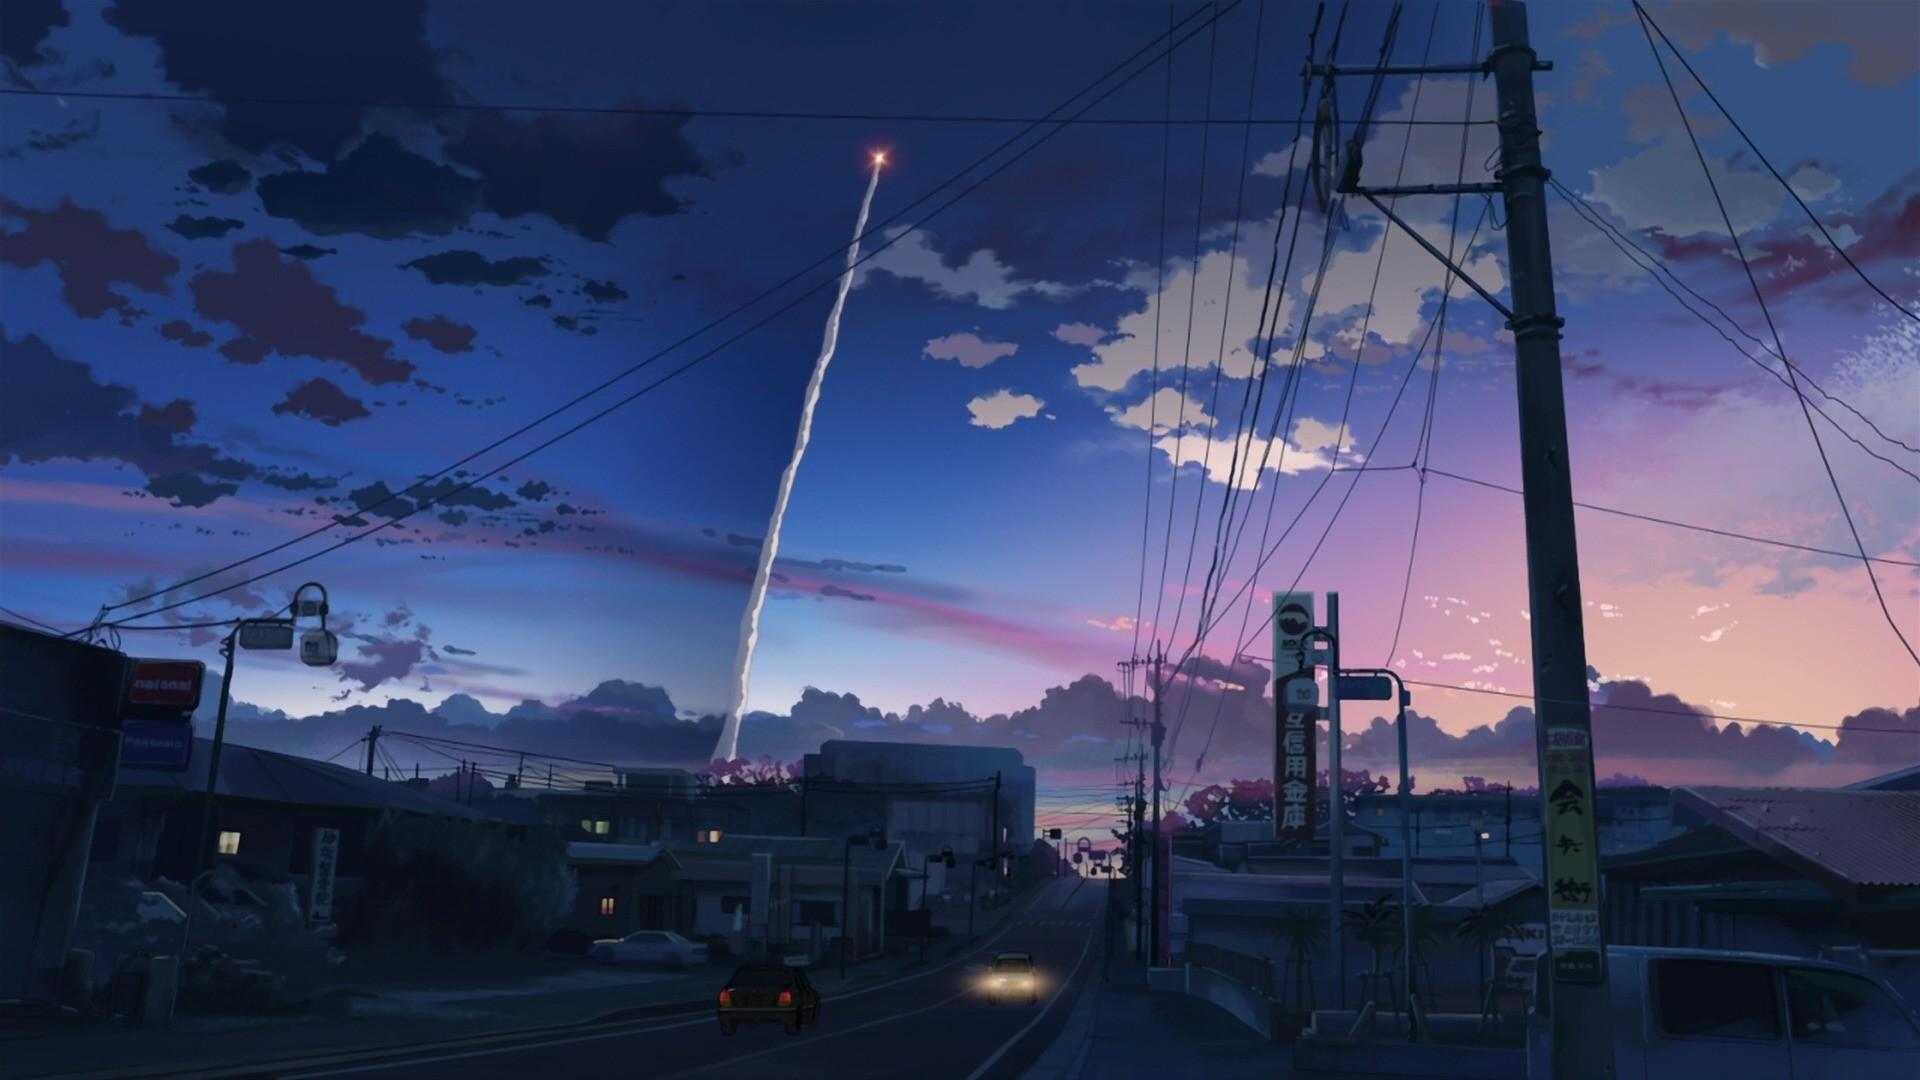 Anime Scenery Wallpaper theme